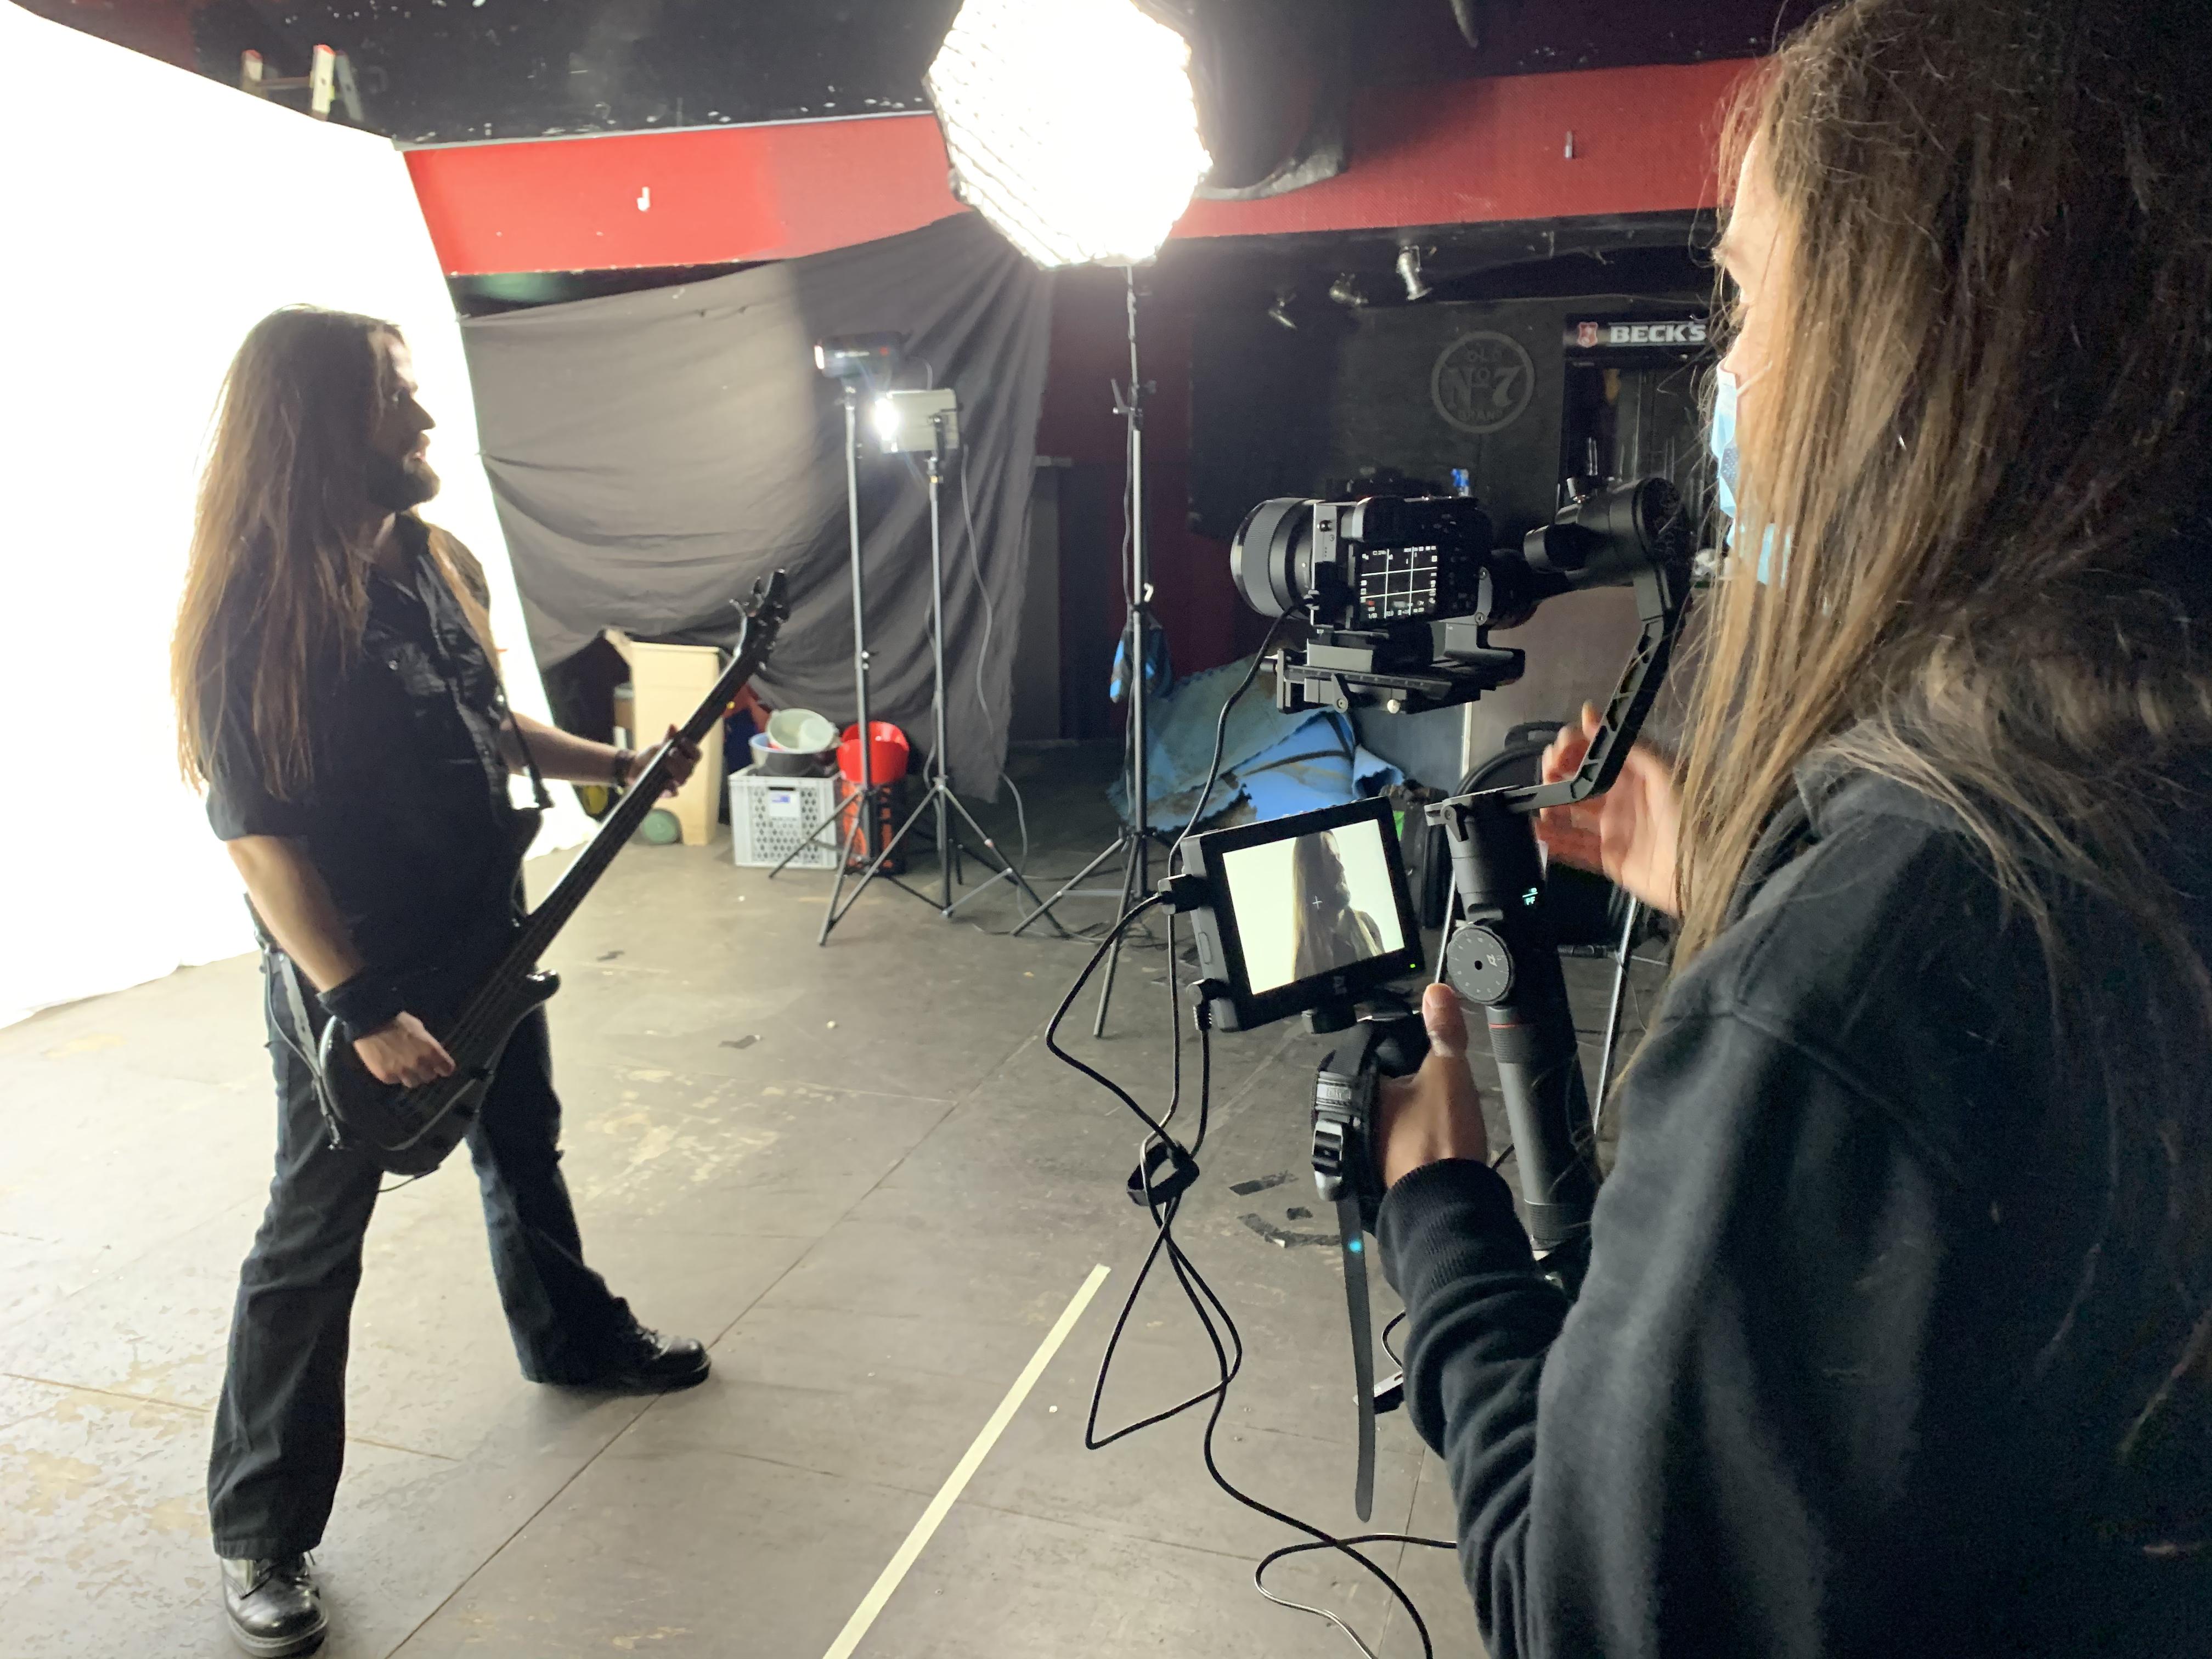 The-Very-End-Metal-Video-Shoot-behind-the-scenes_5452